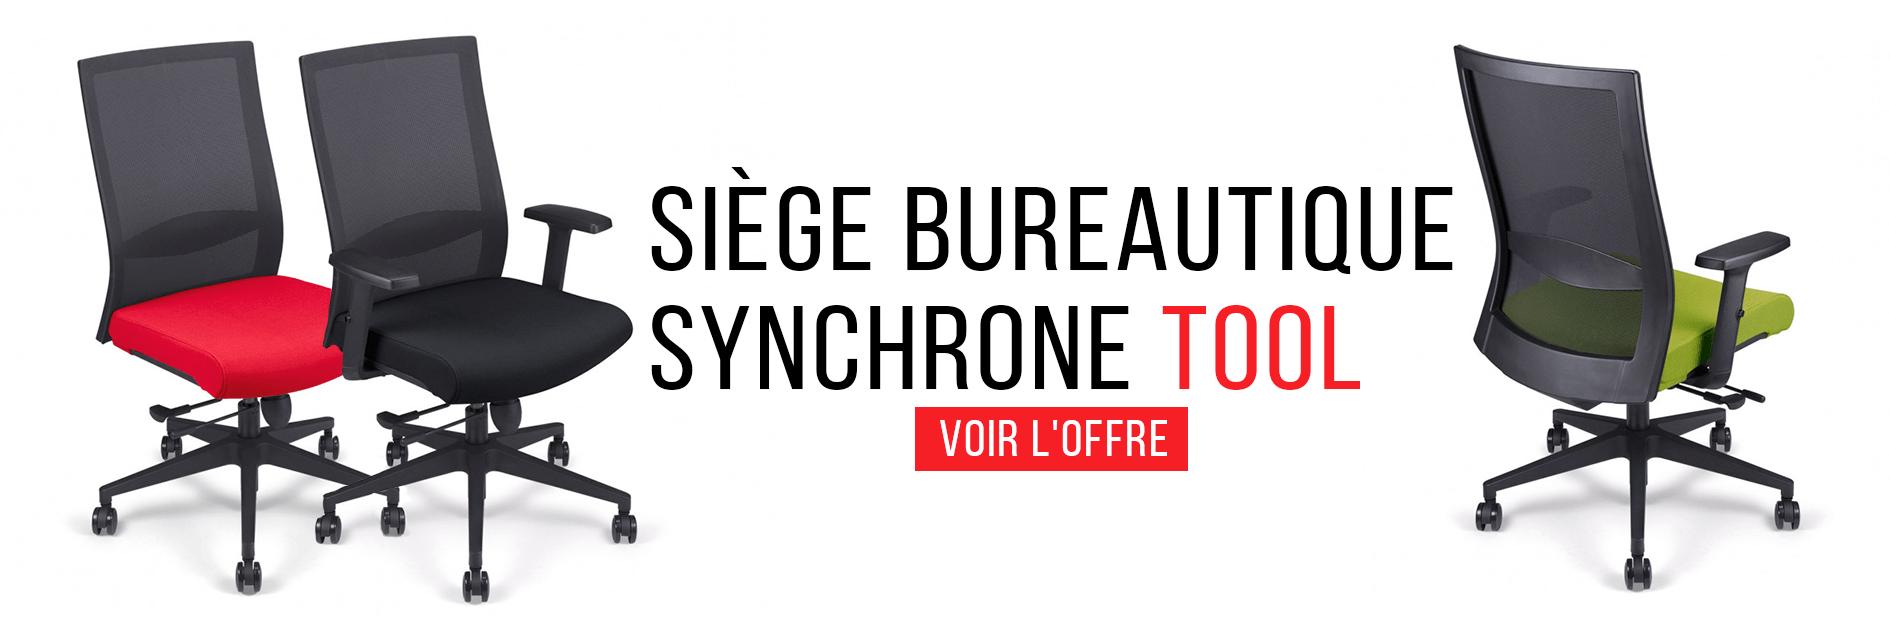 Siège Bureautique Synchrone - Tool